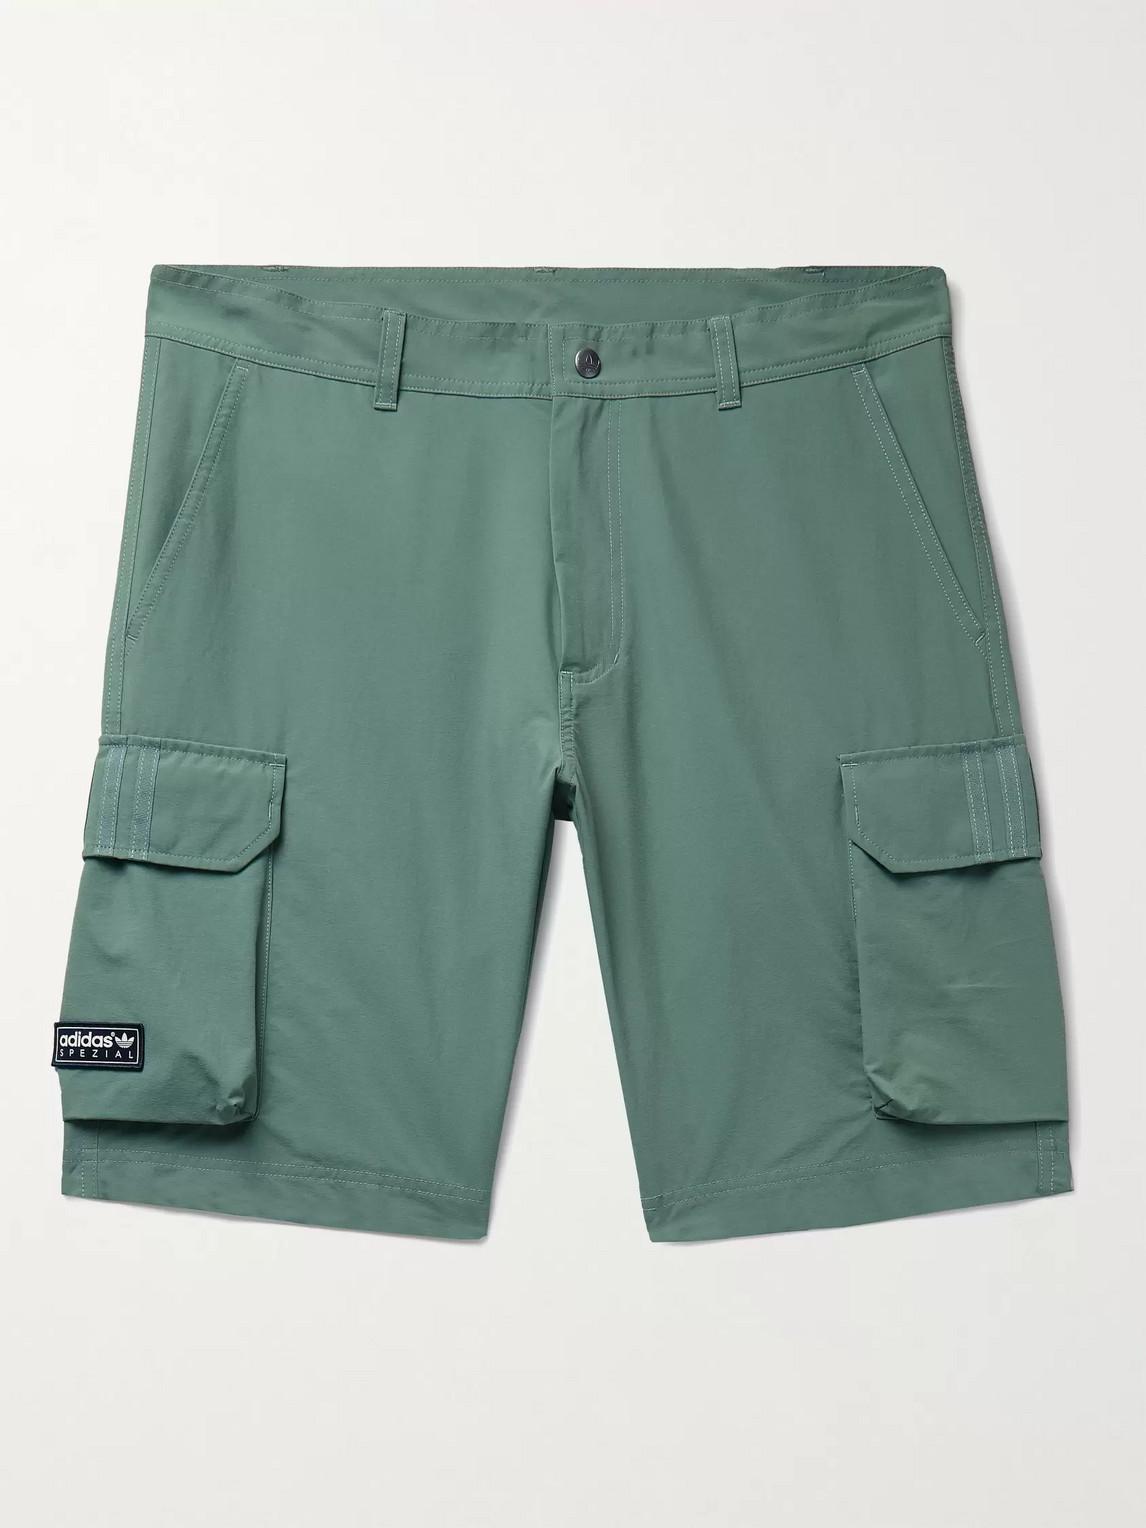 Adidas Consortium Spezial Standish Shell Cargo Shorts In Green